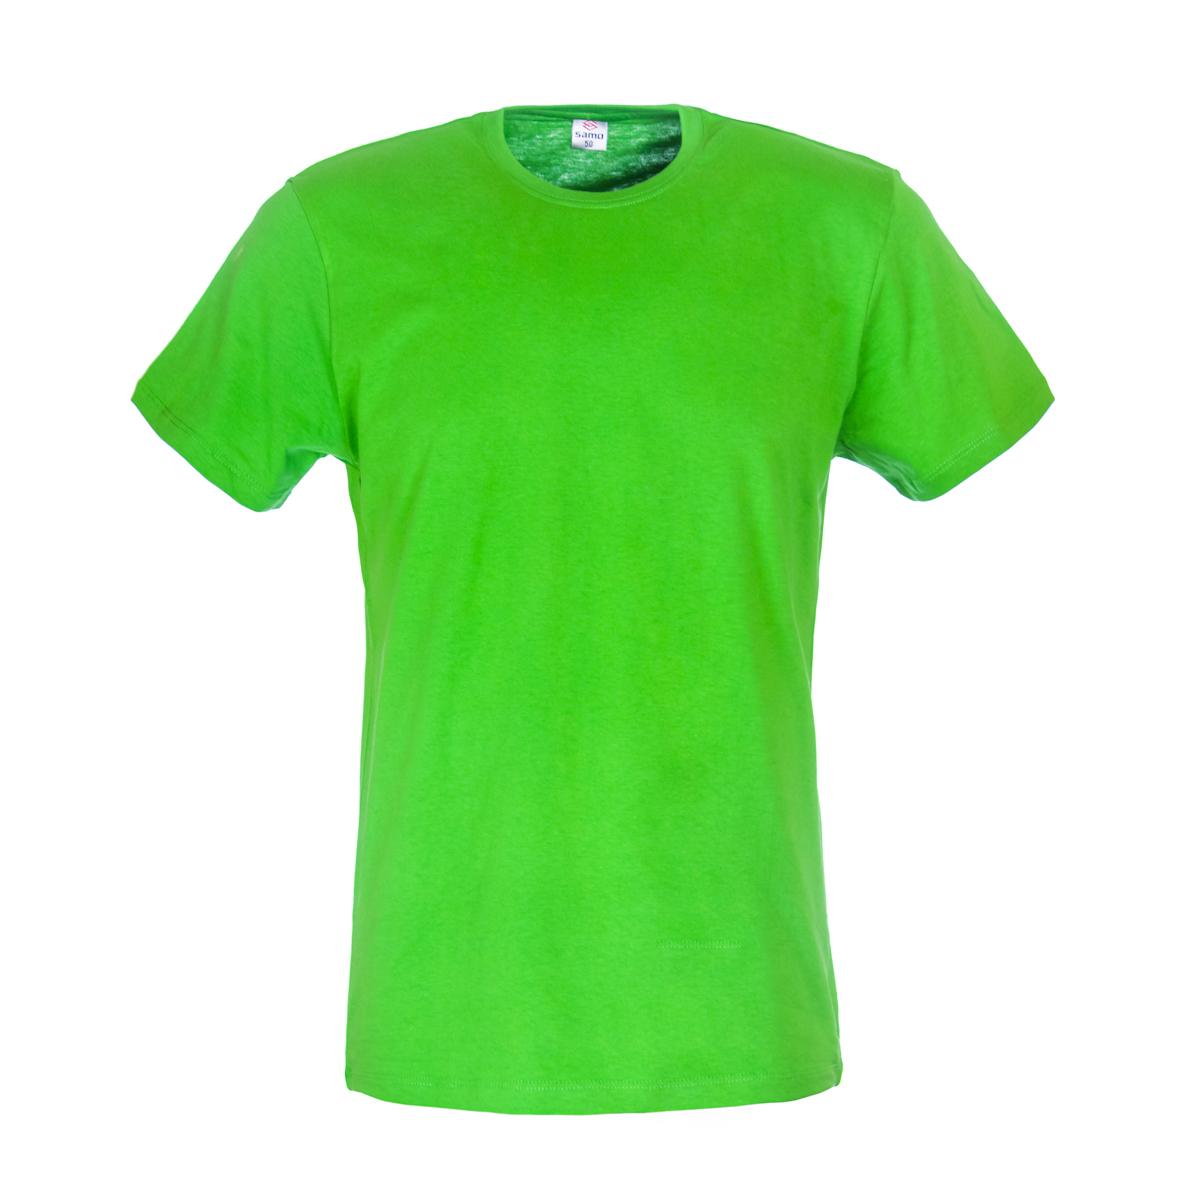 Муж. футболка арт. 04-0044 Зеленый р. 56Футболки и майки<br>Фактический ОГ:120 см<br>Фактический ОТ:120 см<br>Фактический ОБ:120 см<br>Длина по спинке:79 см<br>Рост:178-186 см<br><br>Тип: Муж. футболка<br>Размер: 56<br>Материал: Супрем